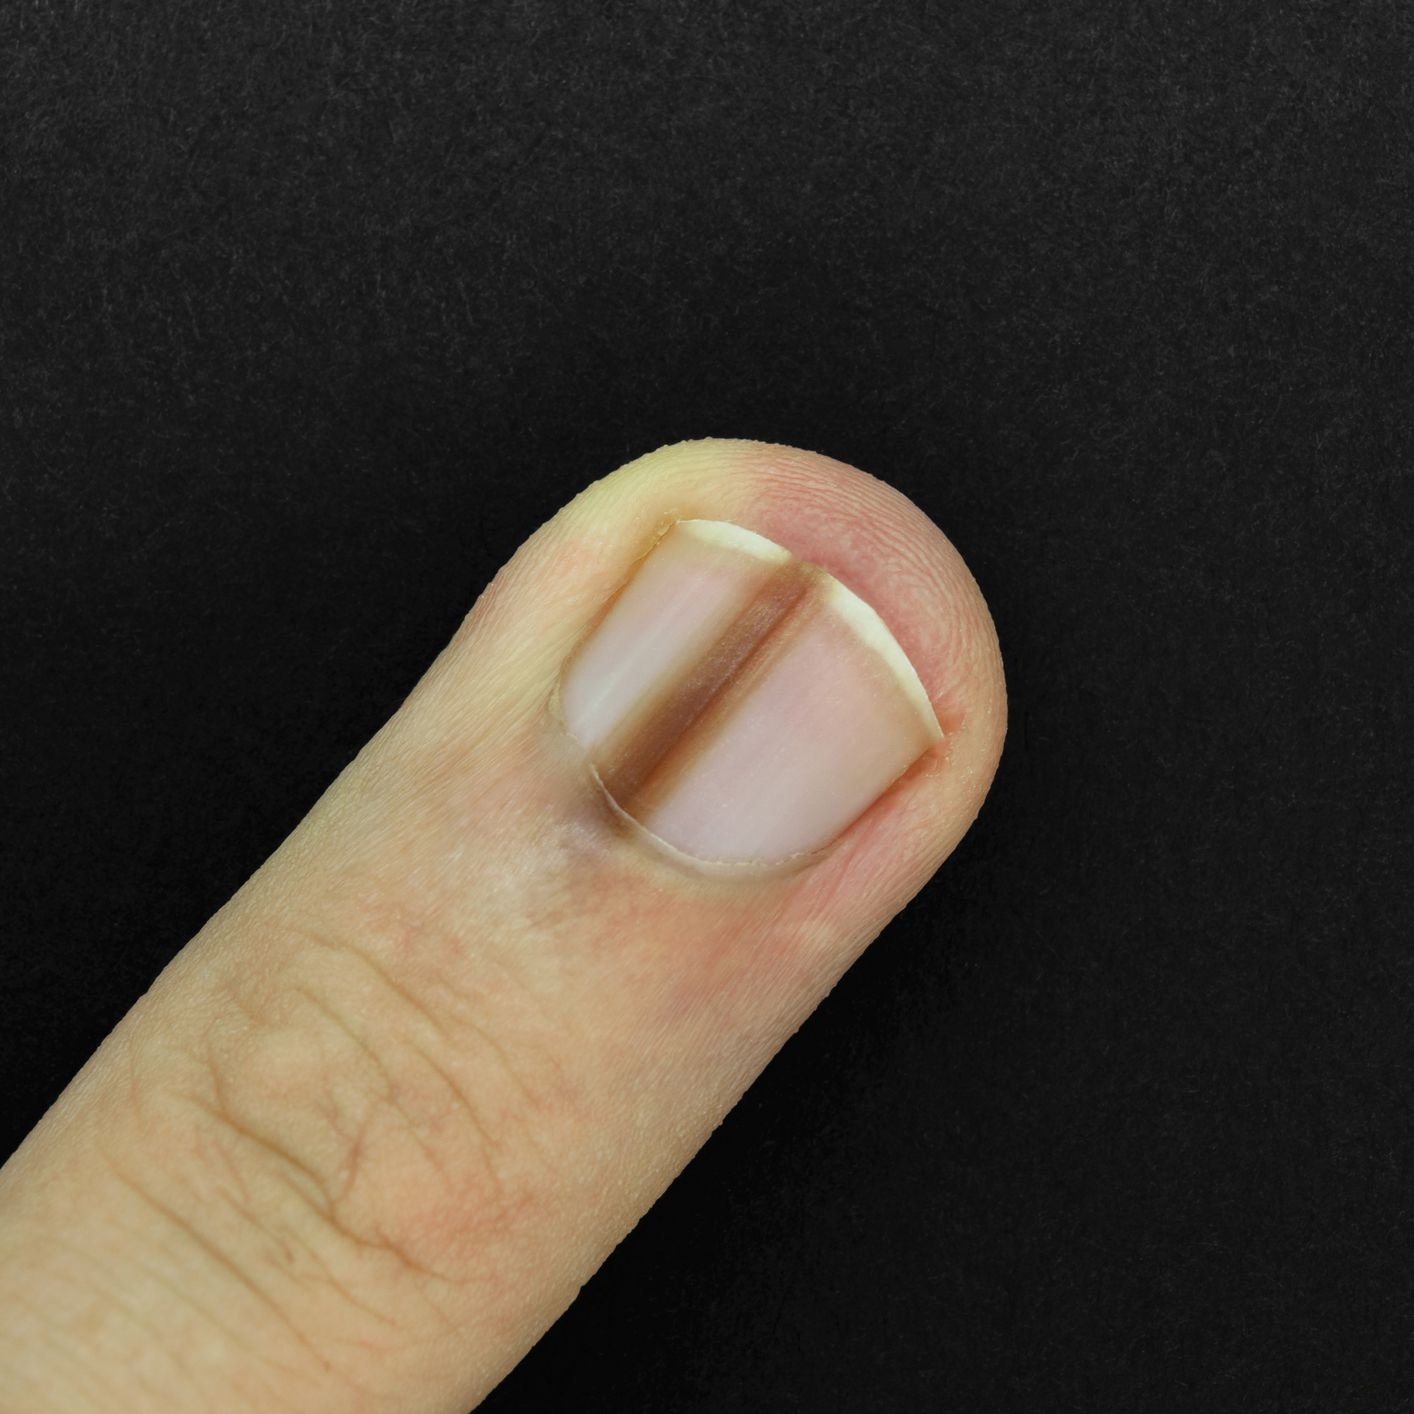 Longitudinal Melanonychia Causes and Risk Factors